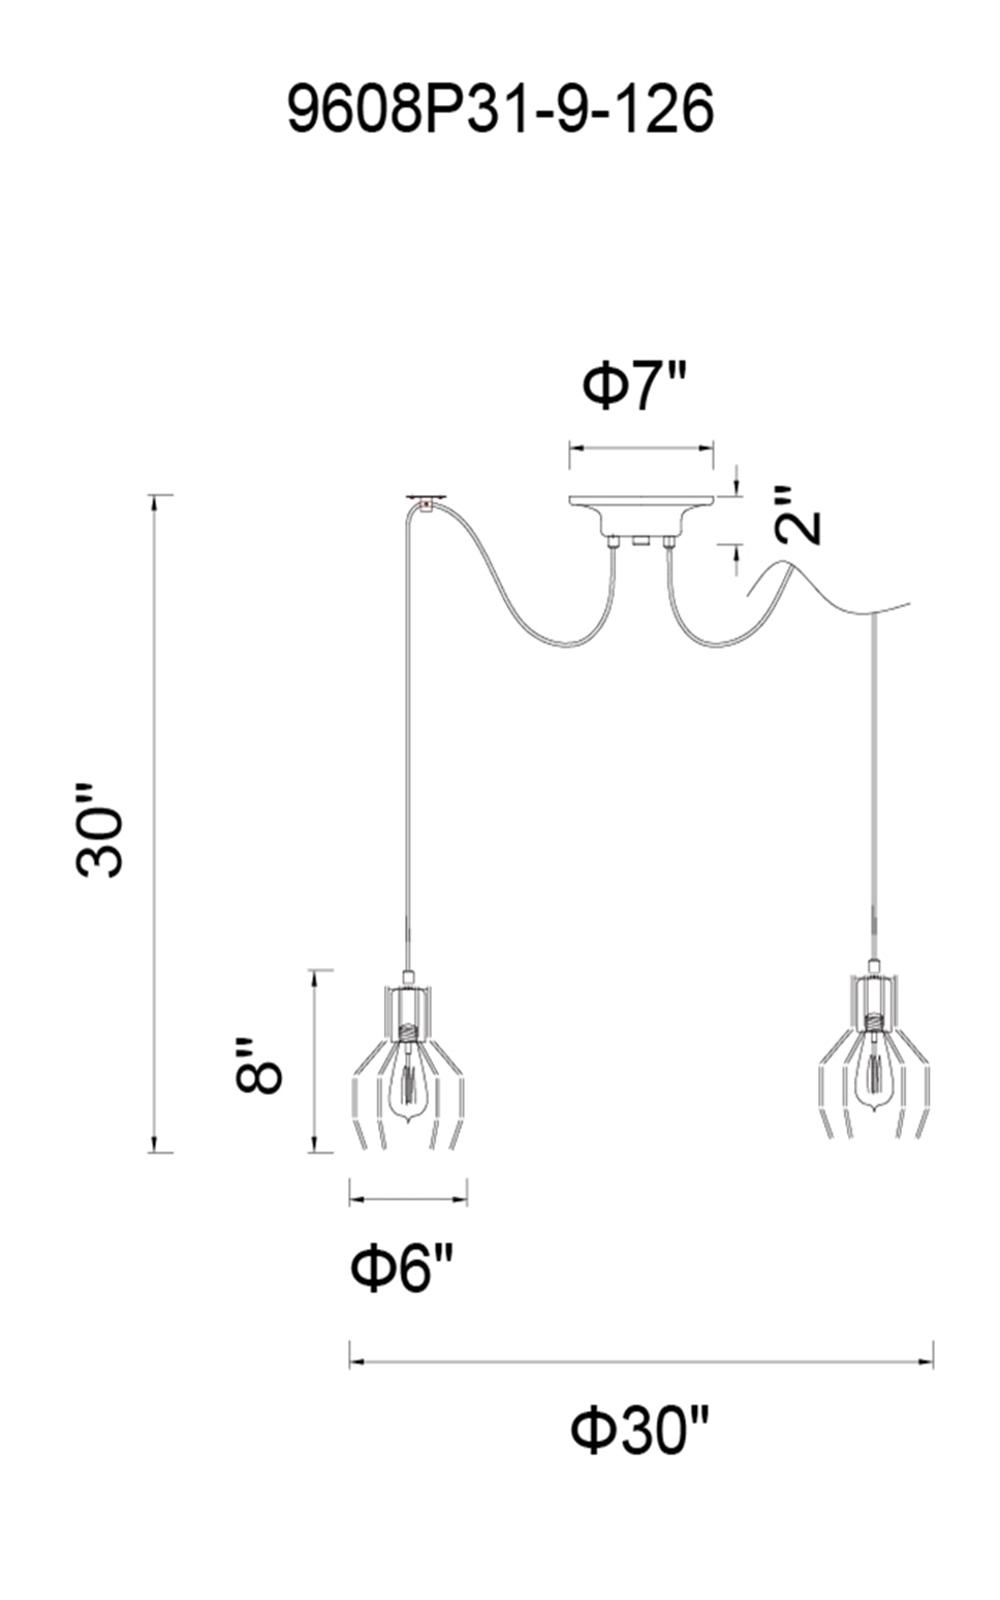 CWI Lighting Secure 9 Light Multi Light Pendant With Black Finish Model: 9608P31-9-101 Line Drawing